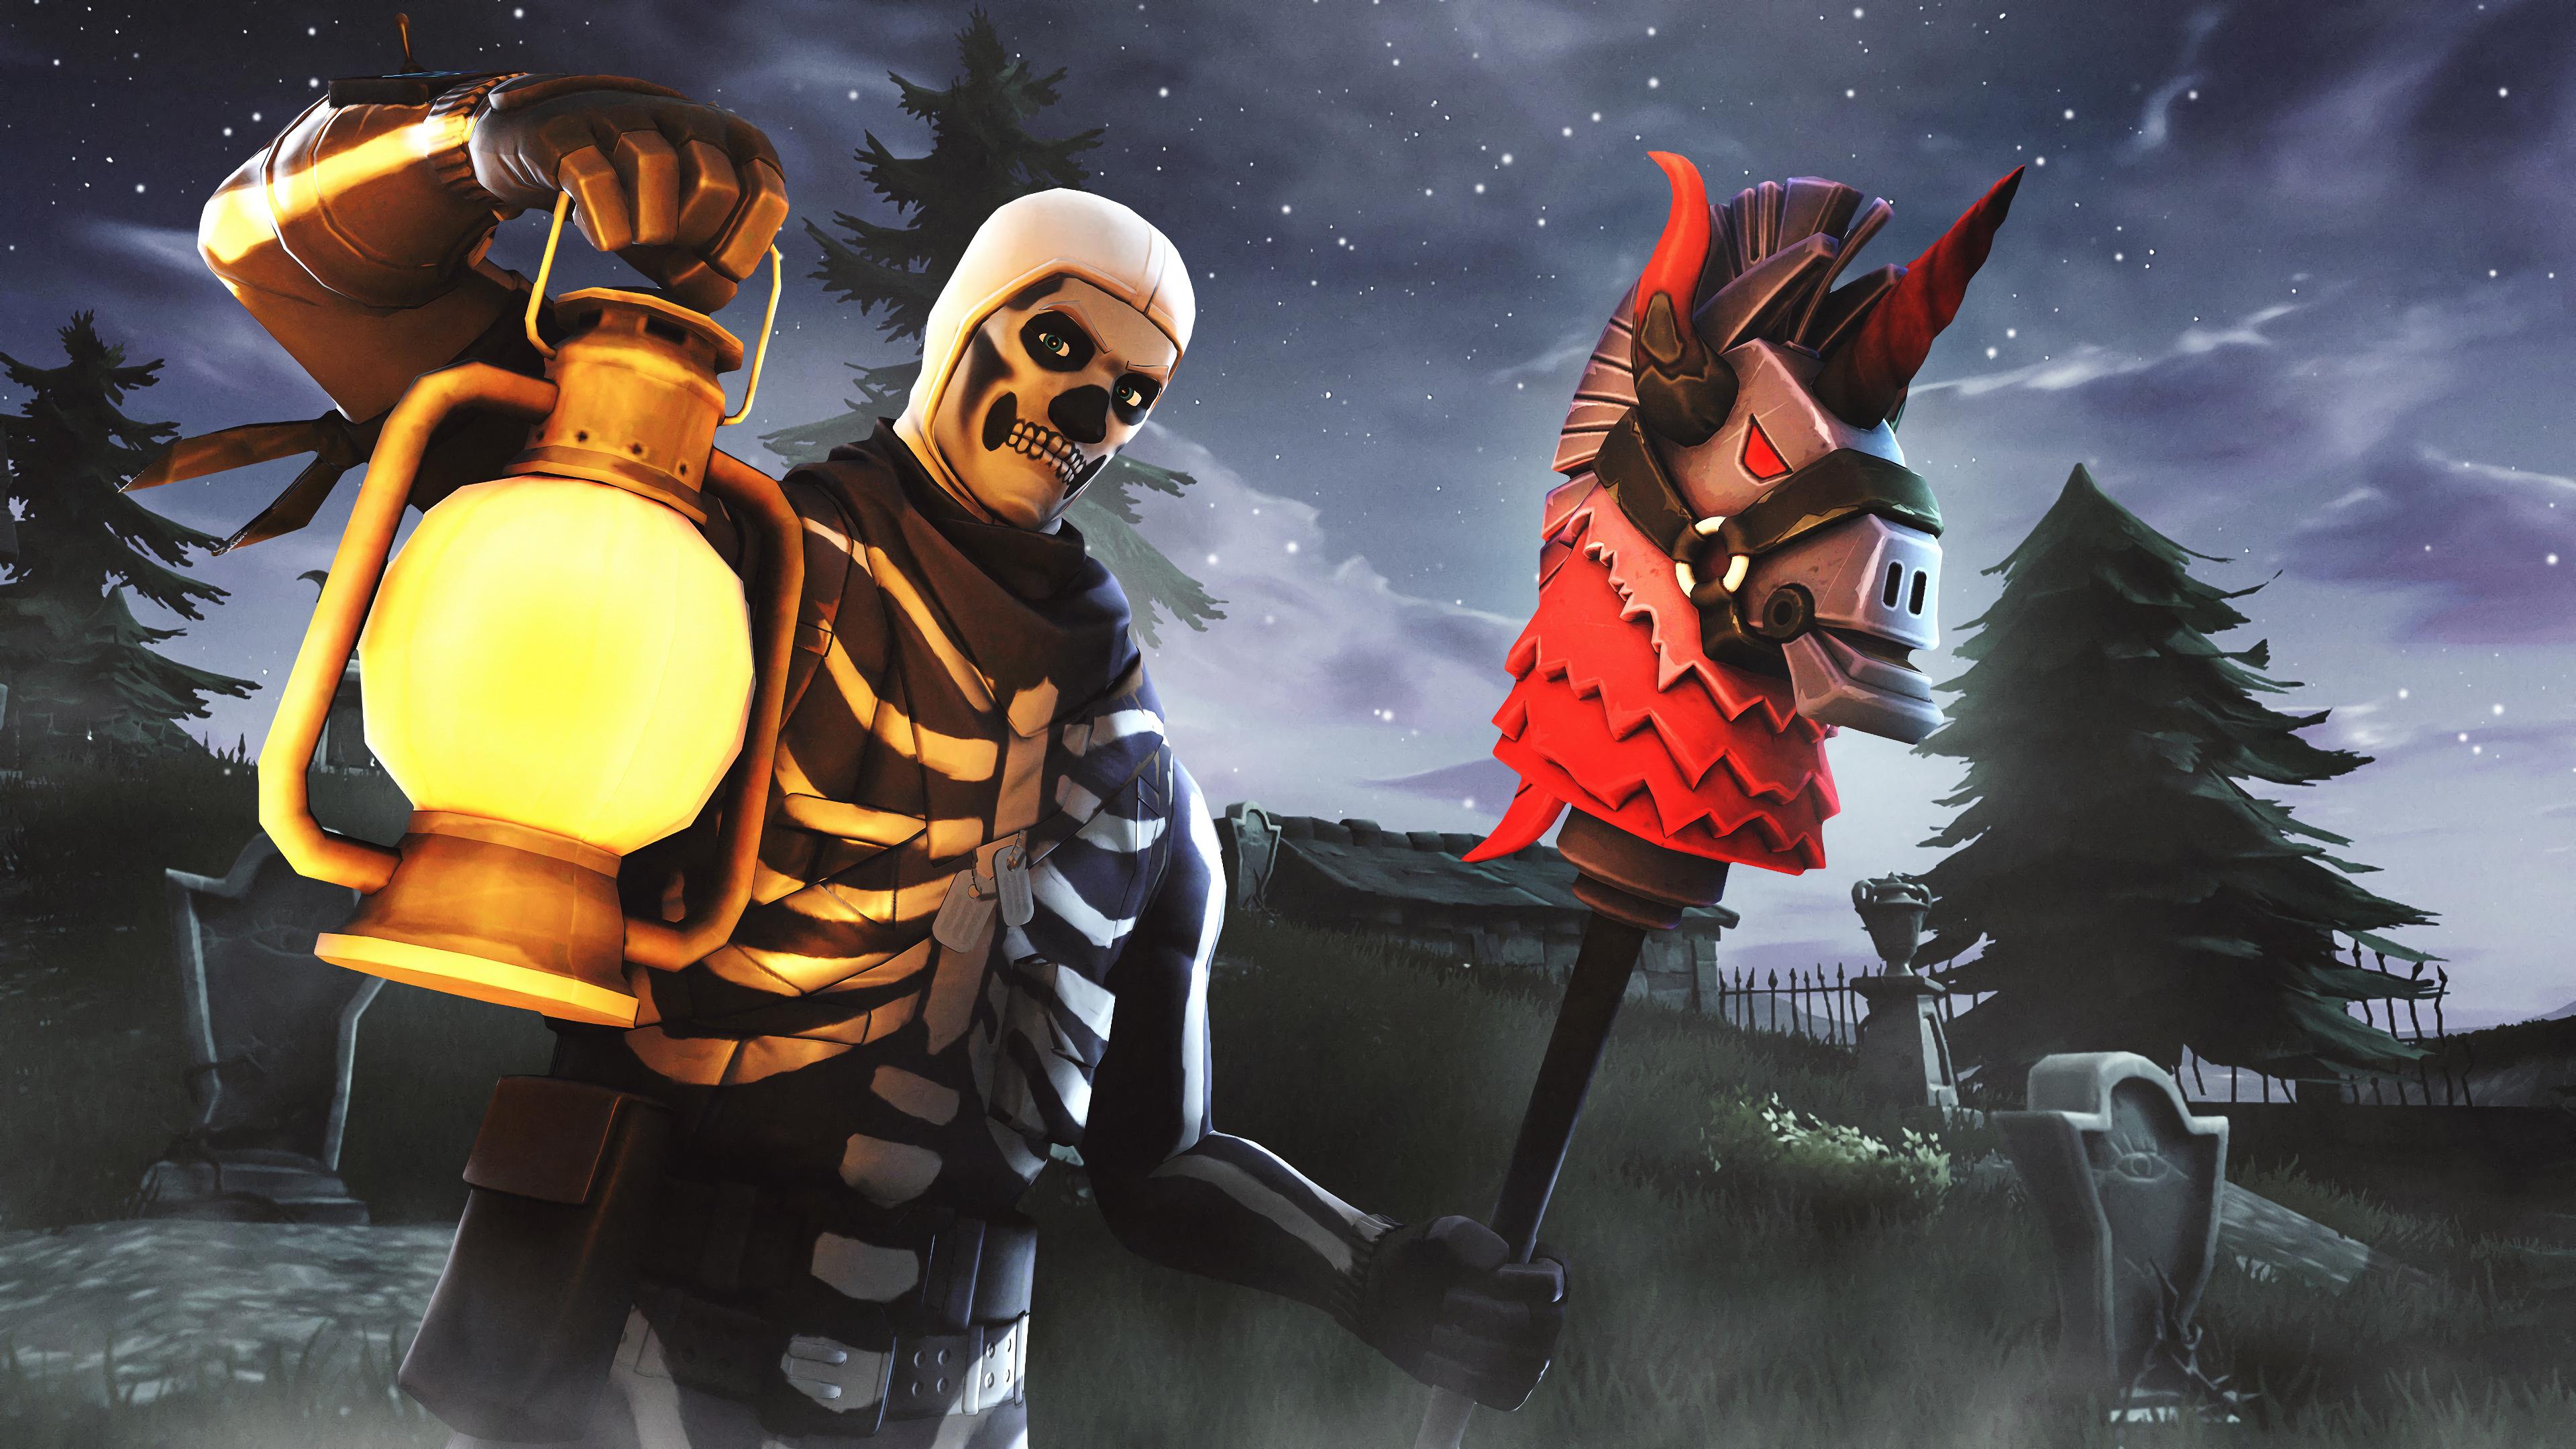 Skull Trooper Fortnite Season 6 4K HD Games 4k Wallpapers 3840x2160